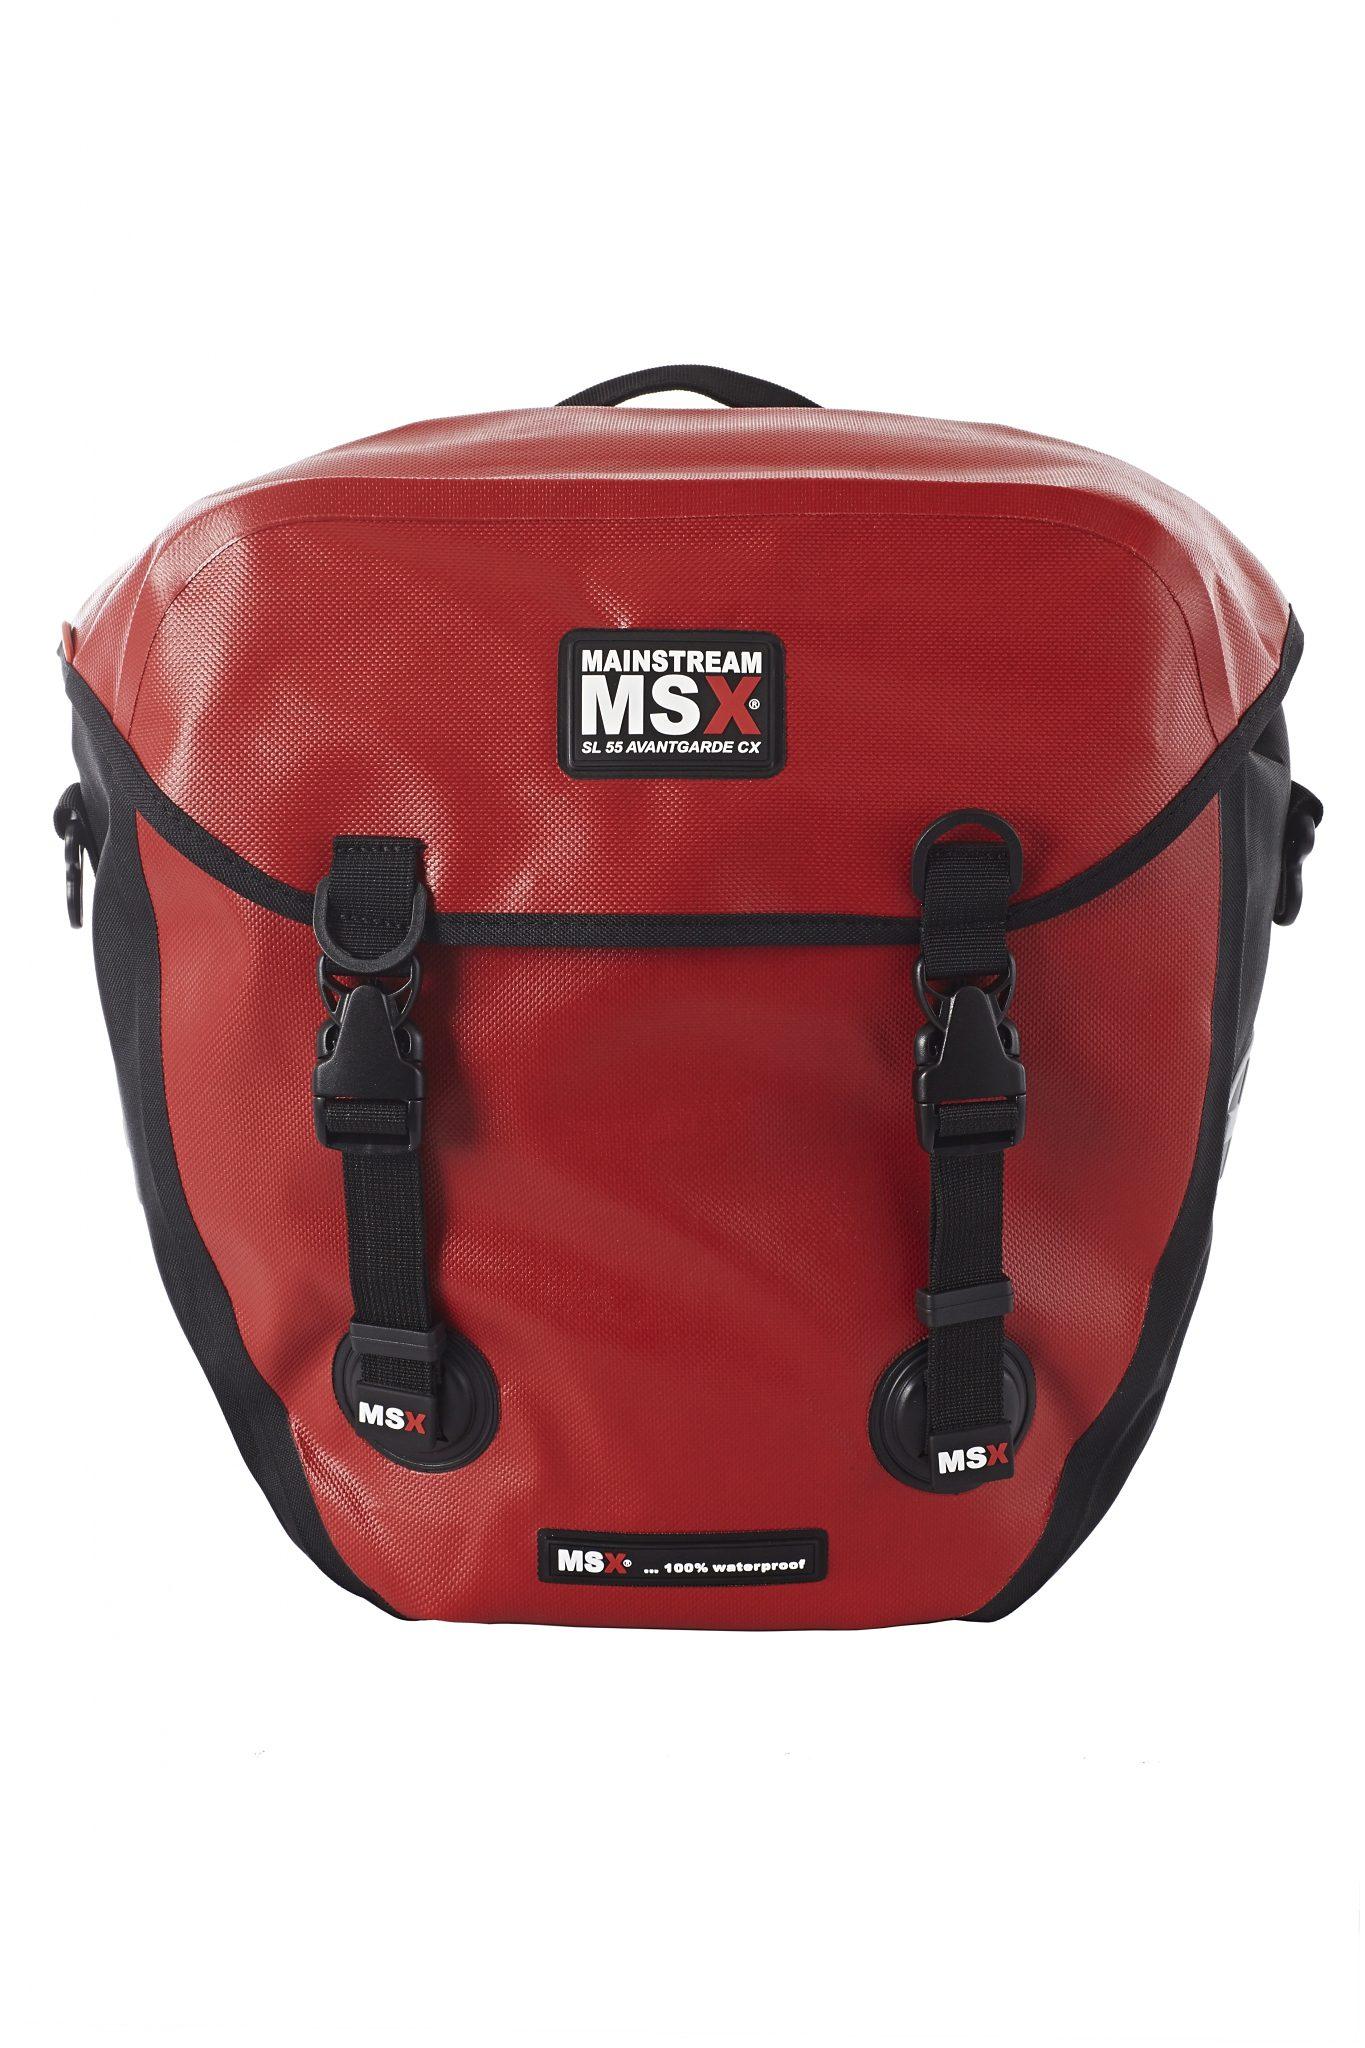 Mainstream MSX Gepäckträgertasche »SL 55 Avantgarde CX rot«